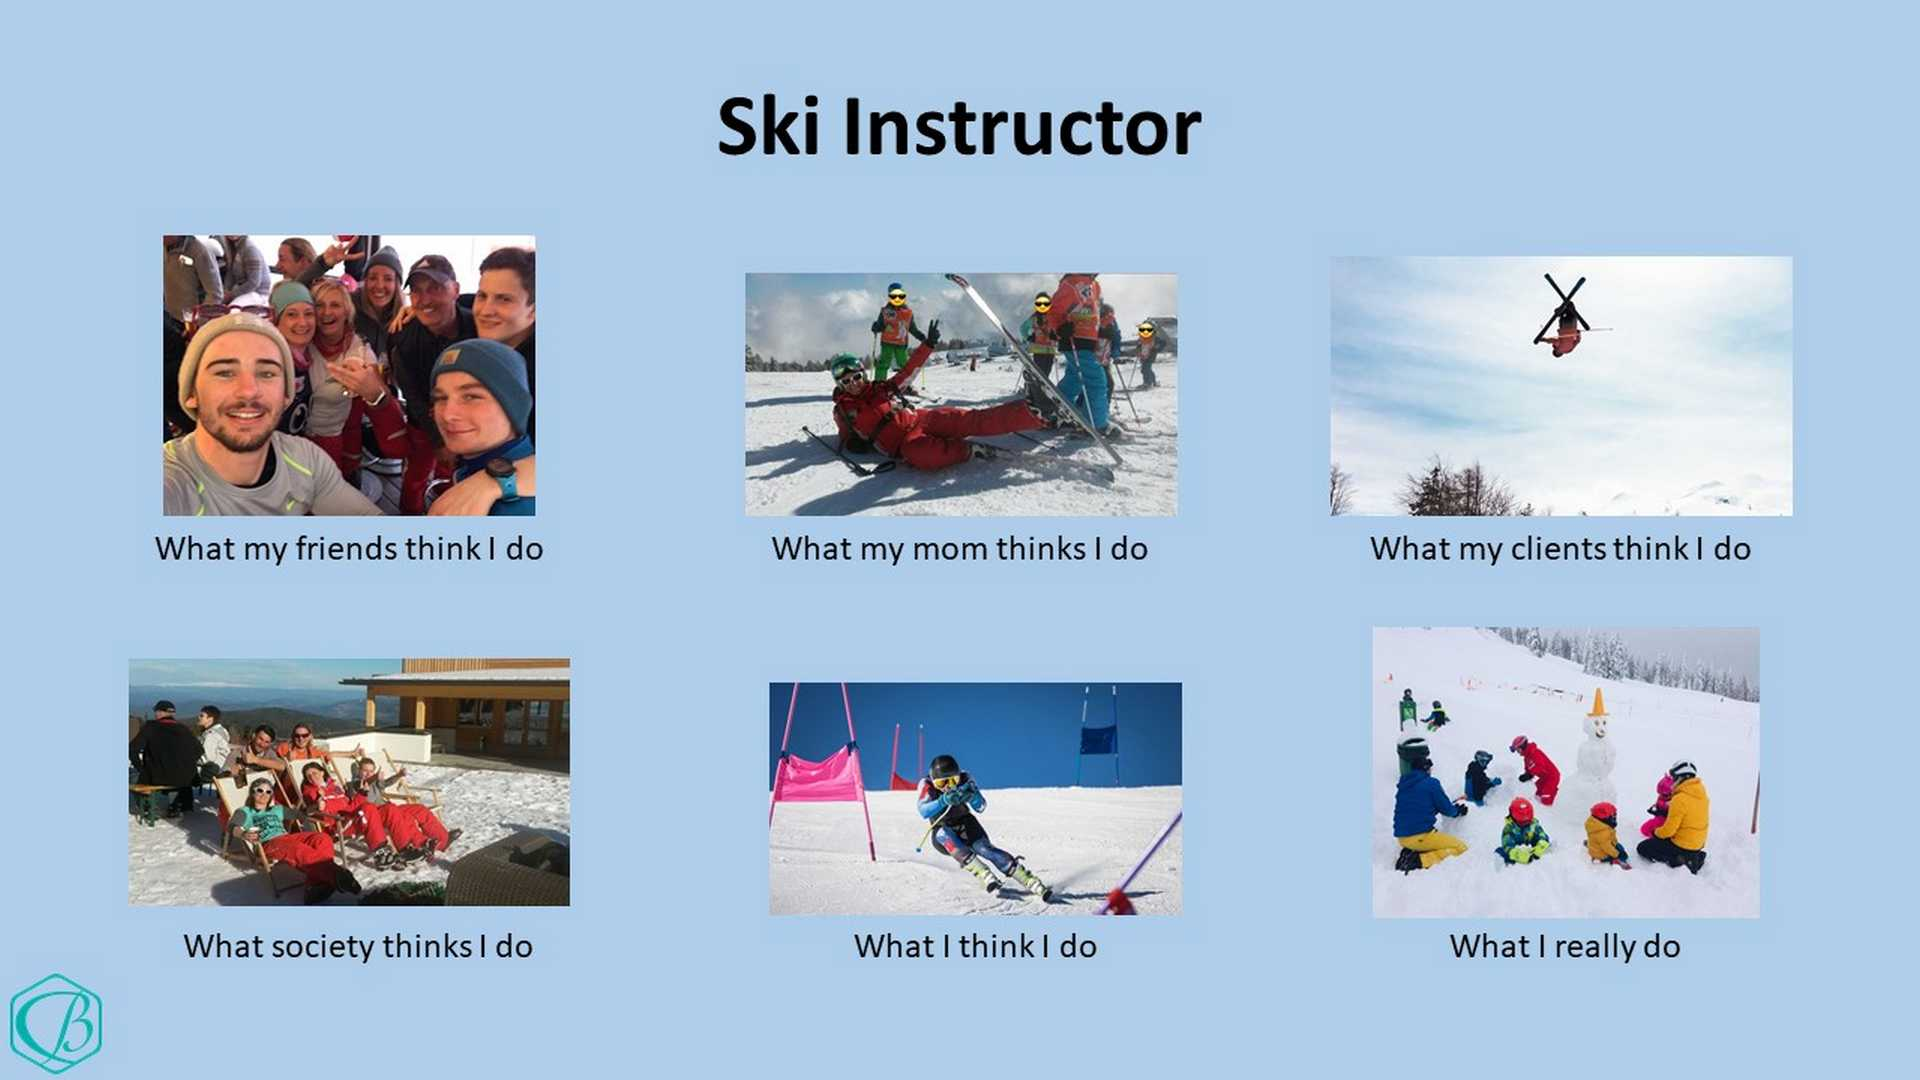 Skilehrer Skiinstructor Skiinstructorlife Winter Skifahren